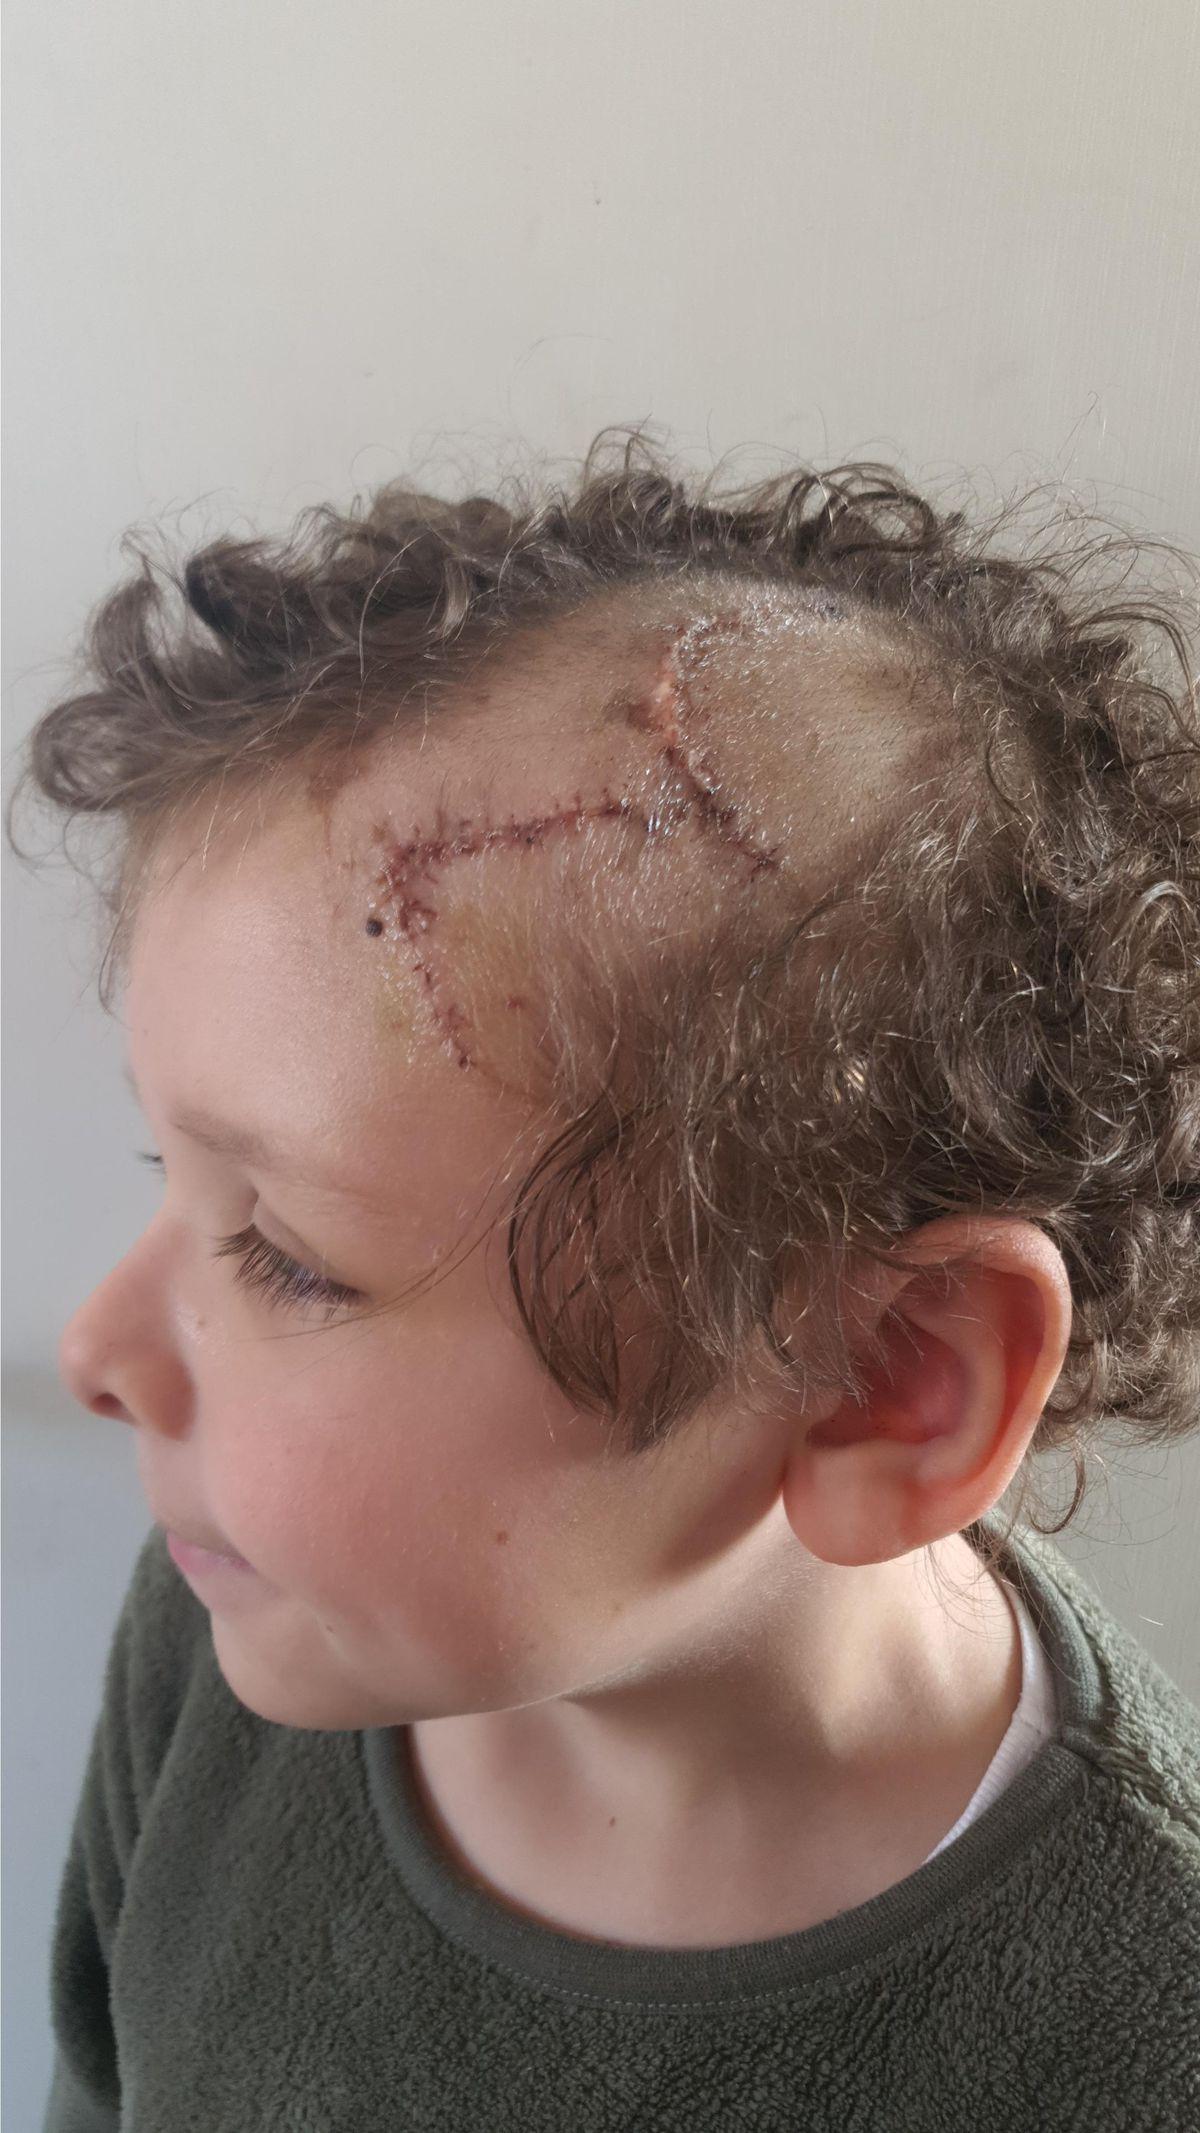 Noah's stitches on his head